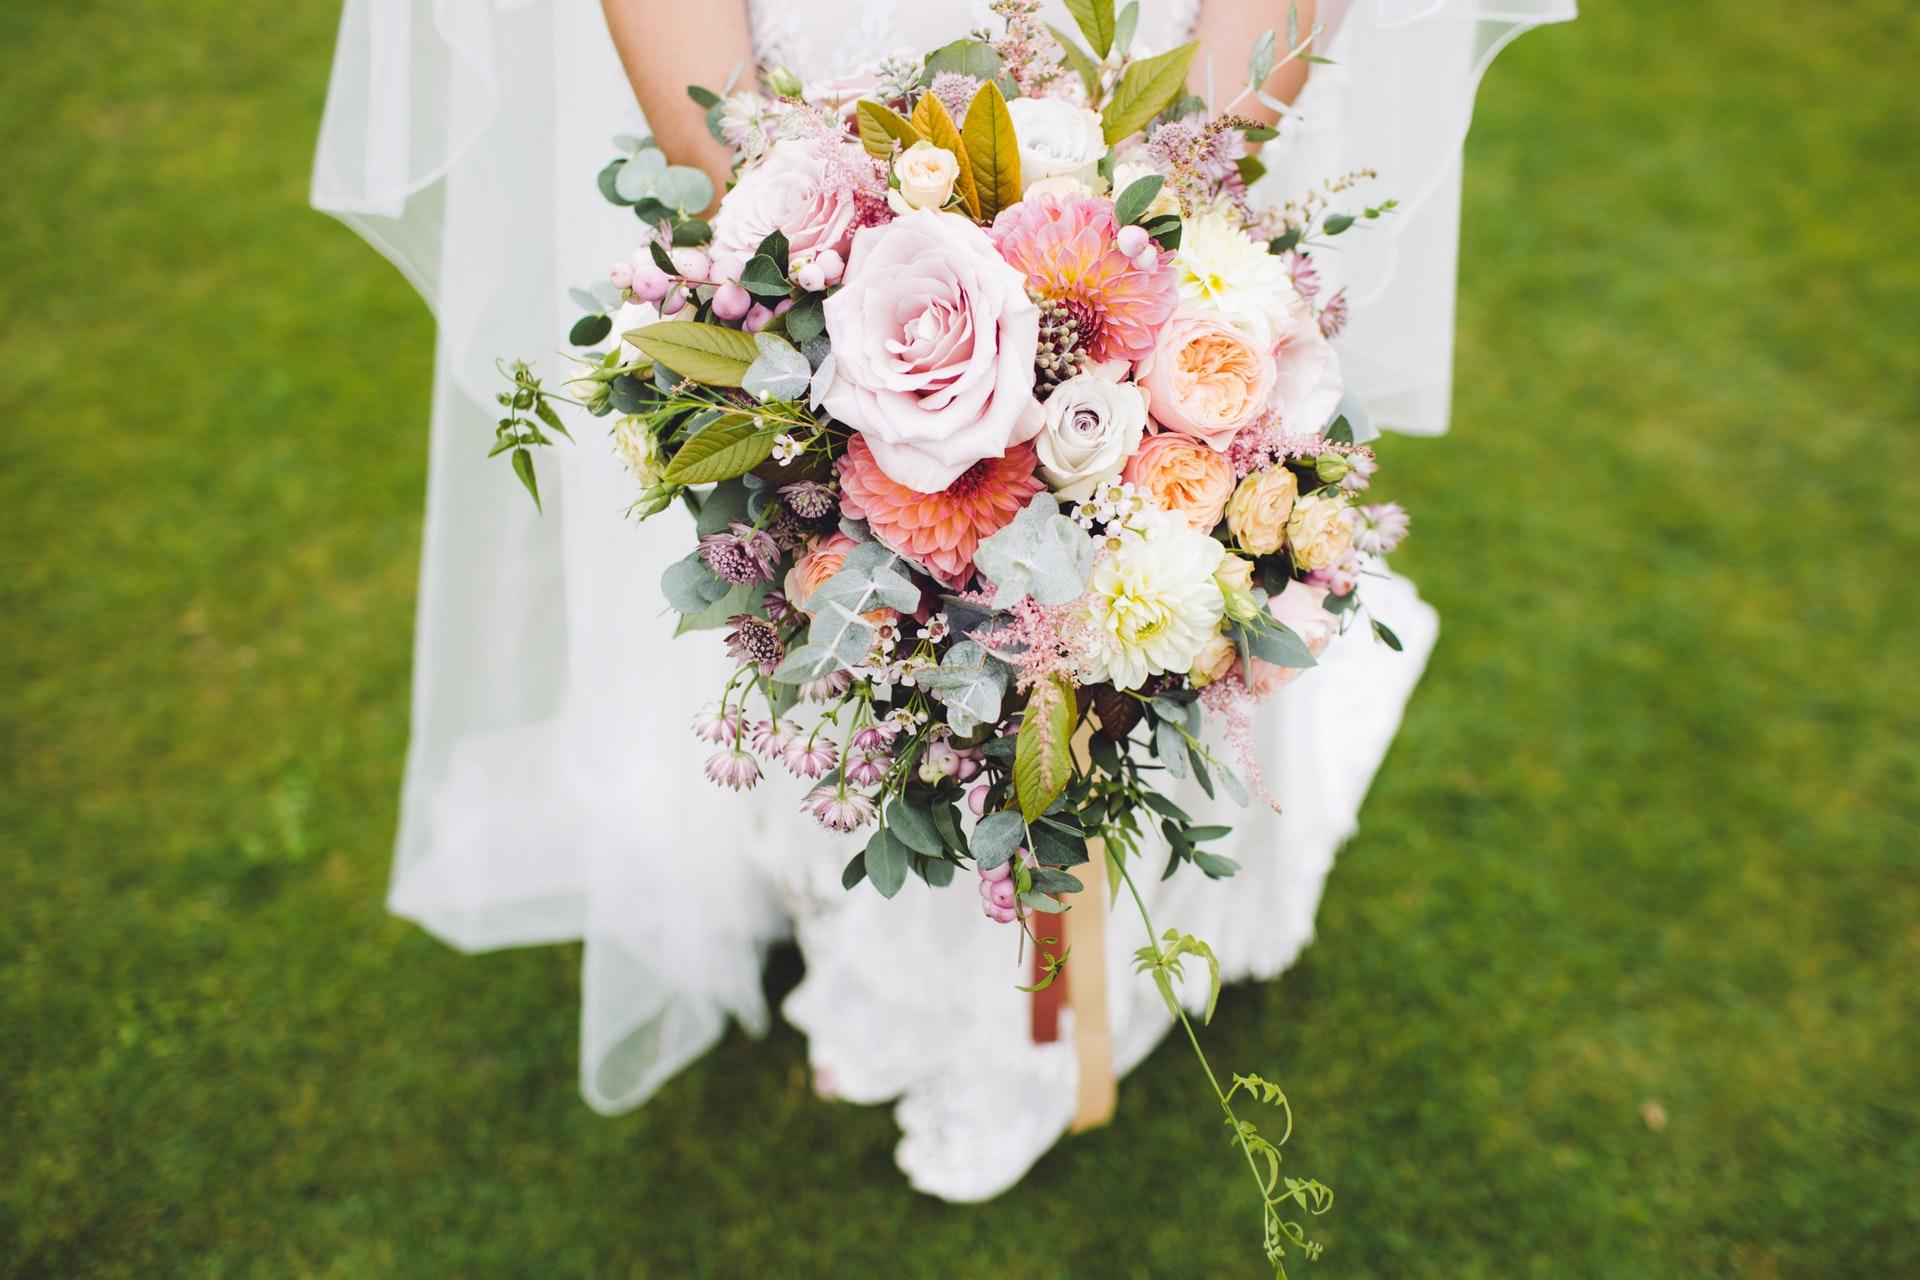 wedding-photography-3T2dQQSO9Vo-unsplash